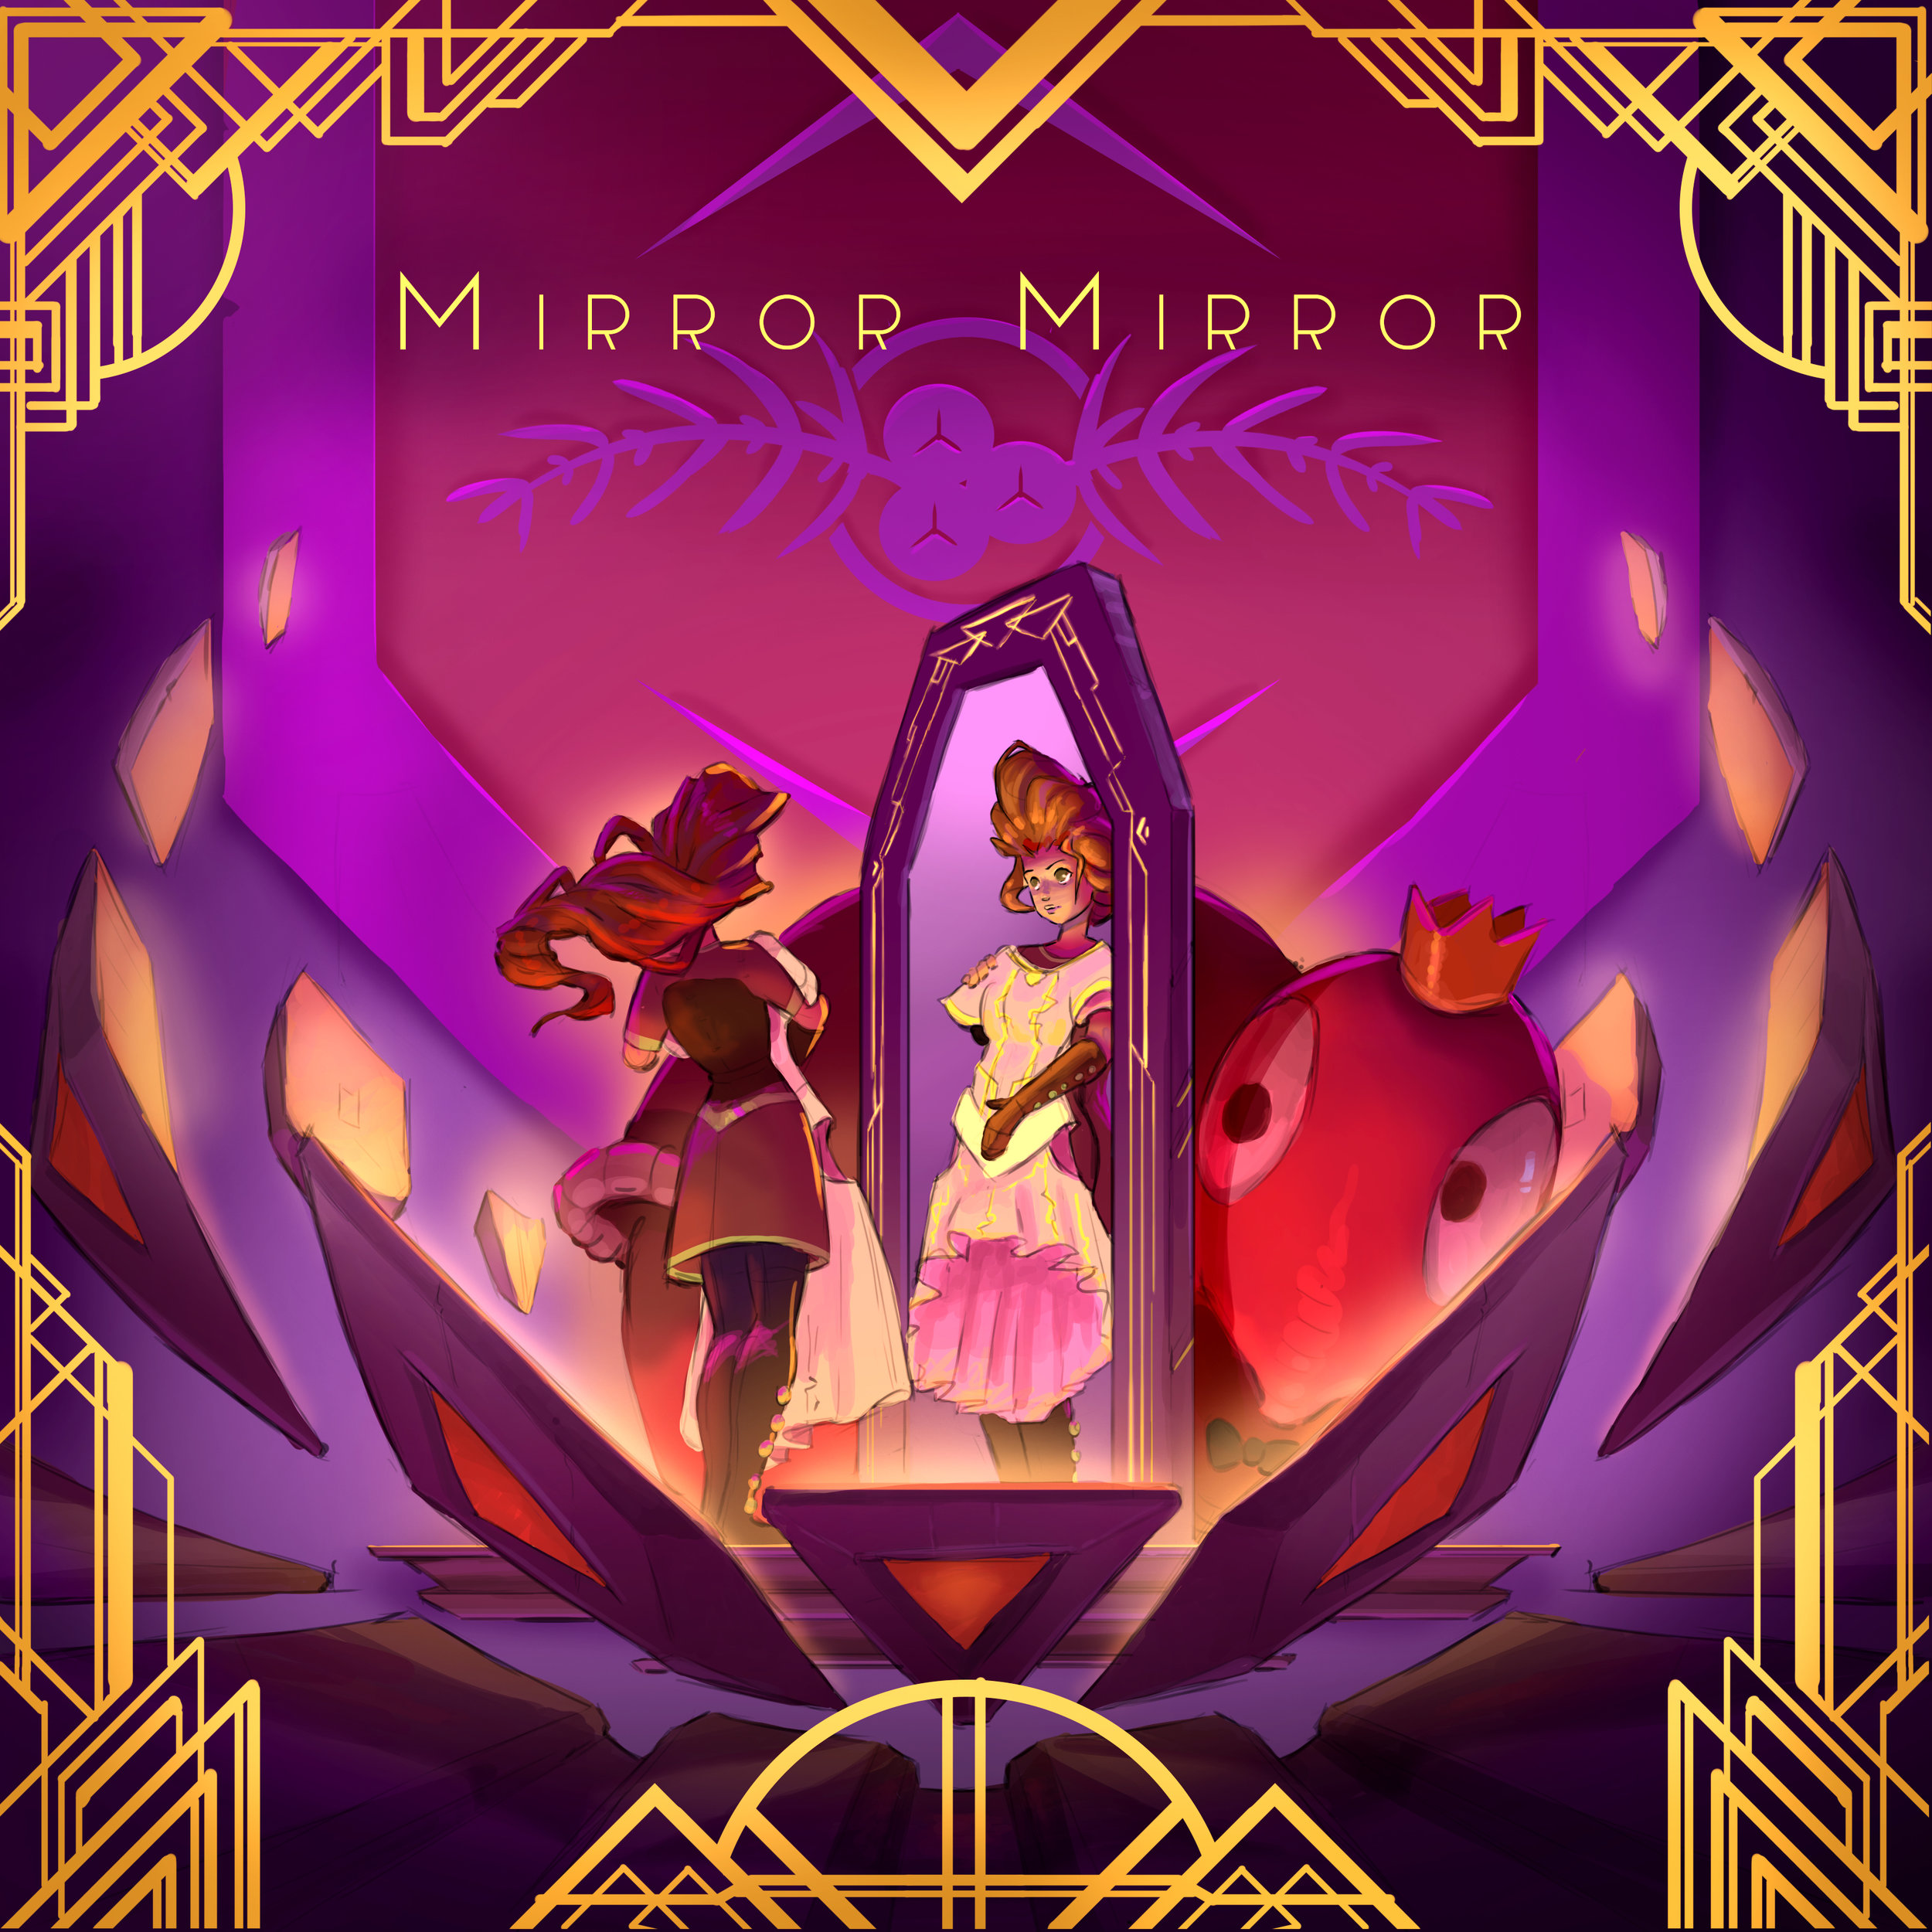 Mirror Mirror 3300p.jpg